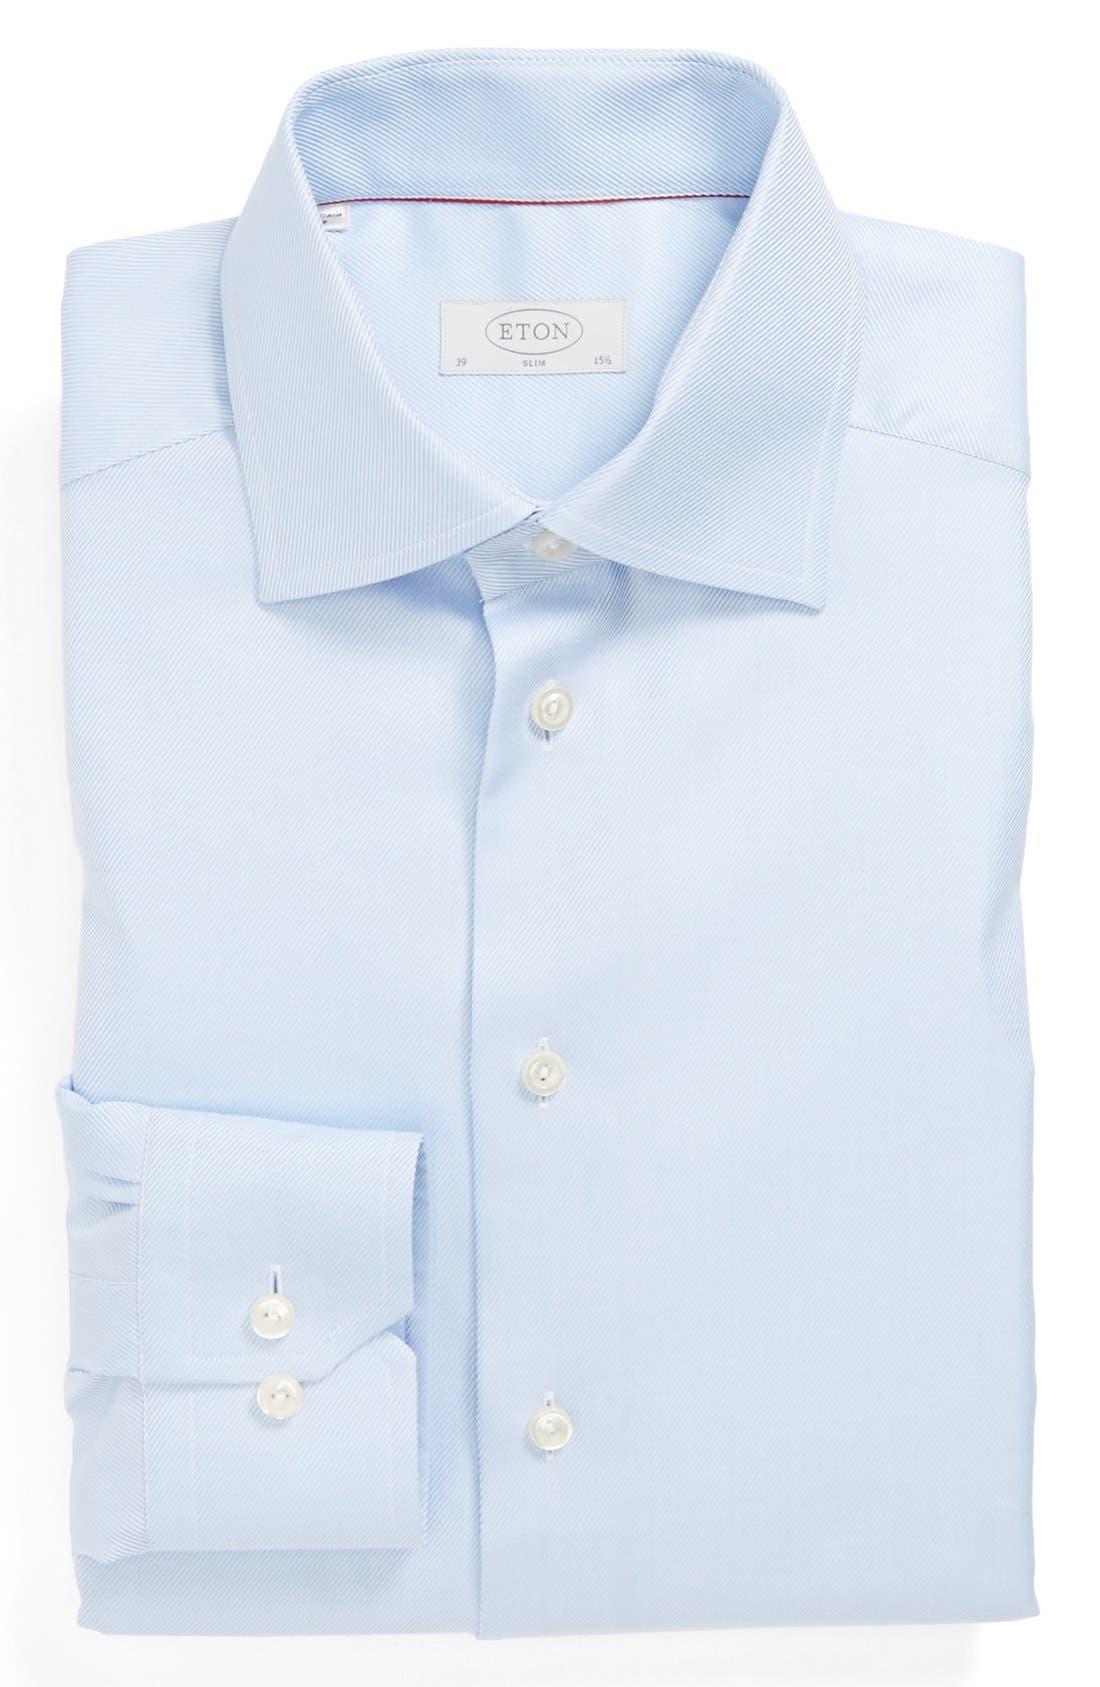 Slim Fit Non-Iron Dress Shirt,                             Main thumbnail 1, color,                             Blue